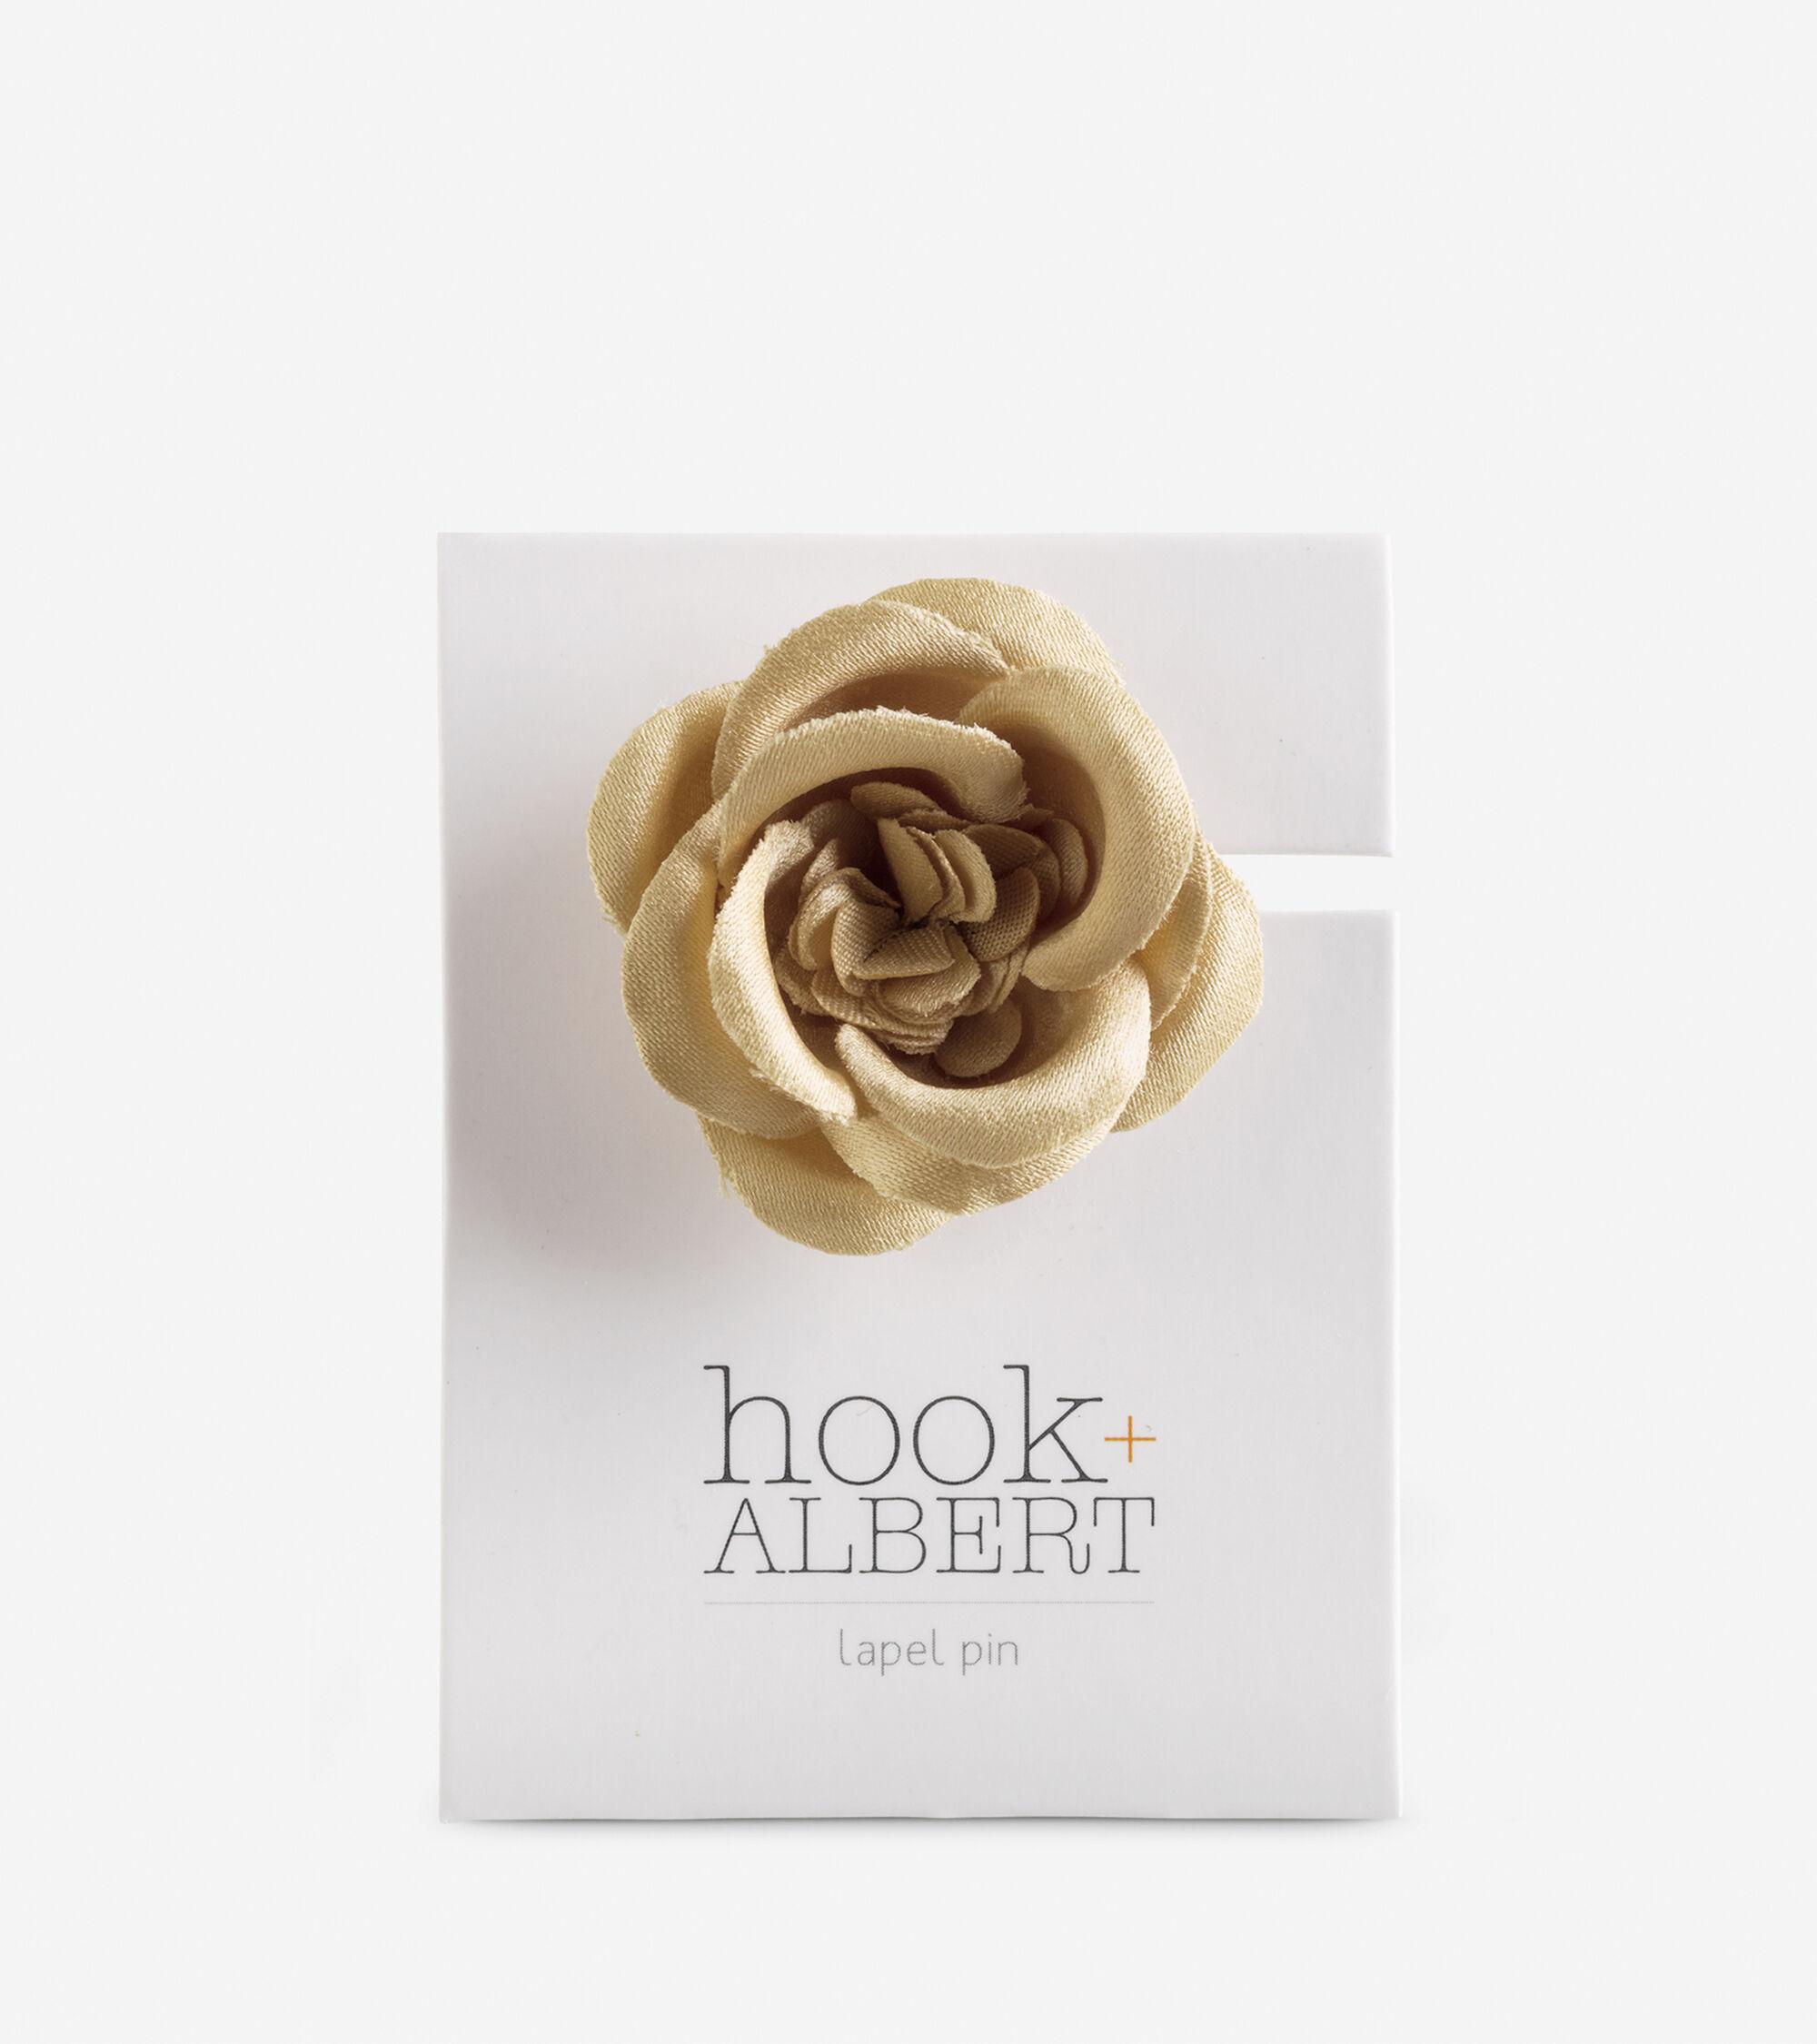 Accessories > hook + ALBERT - Lapel Flower Rose